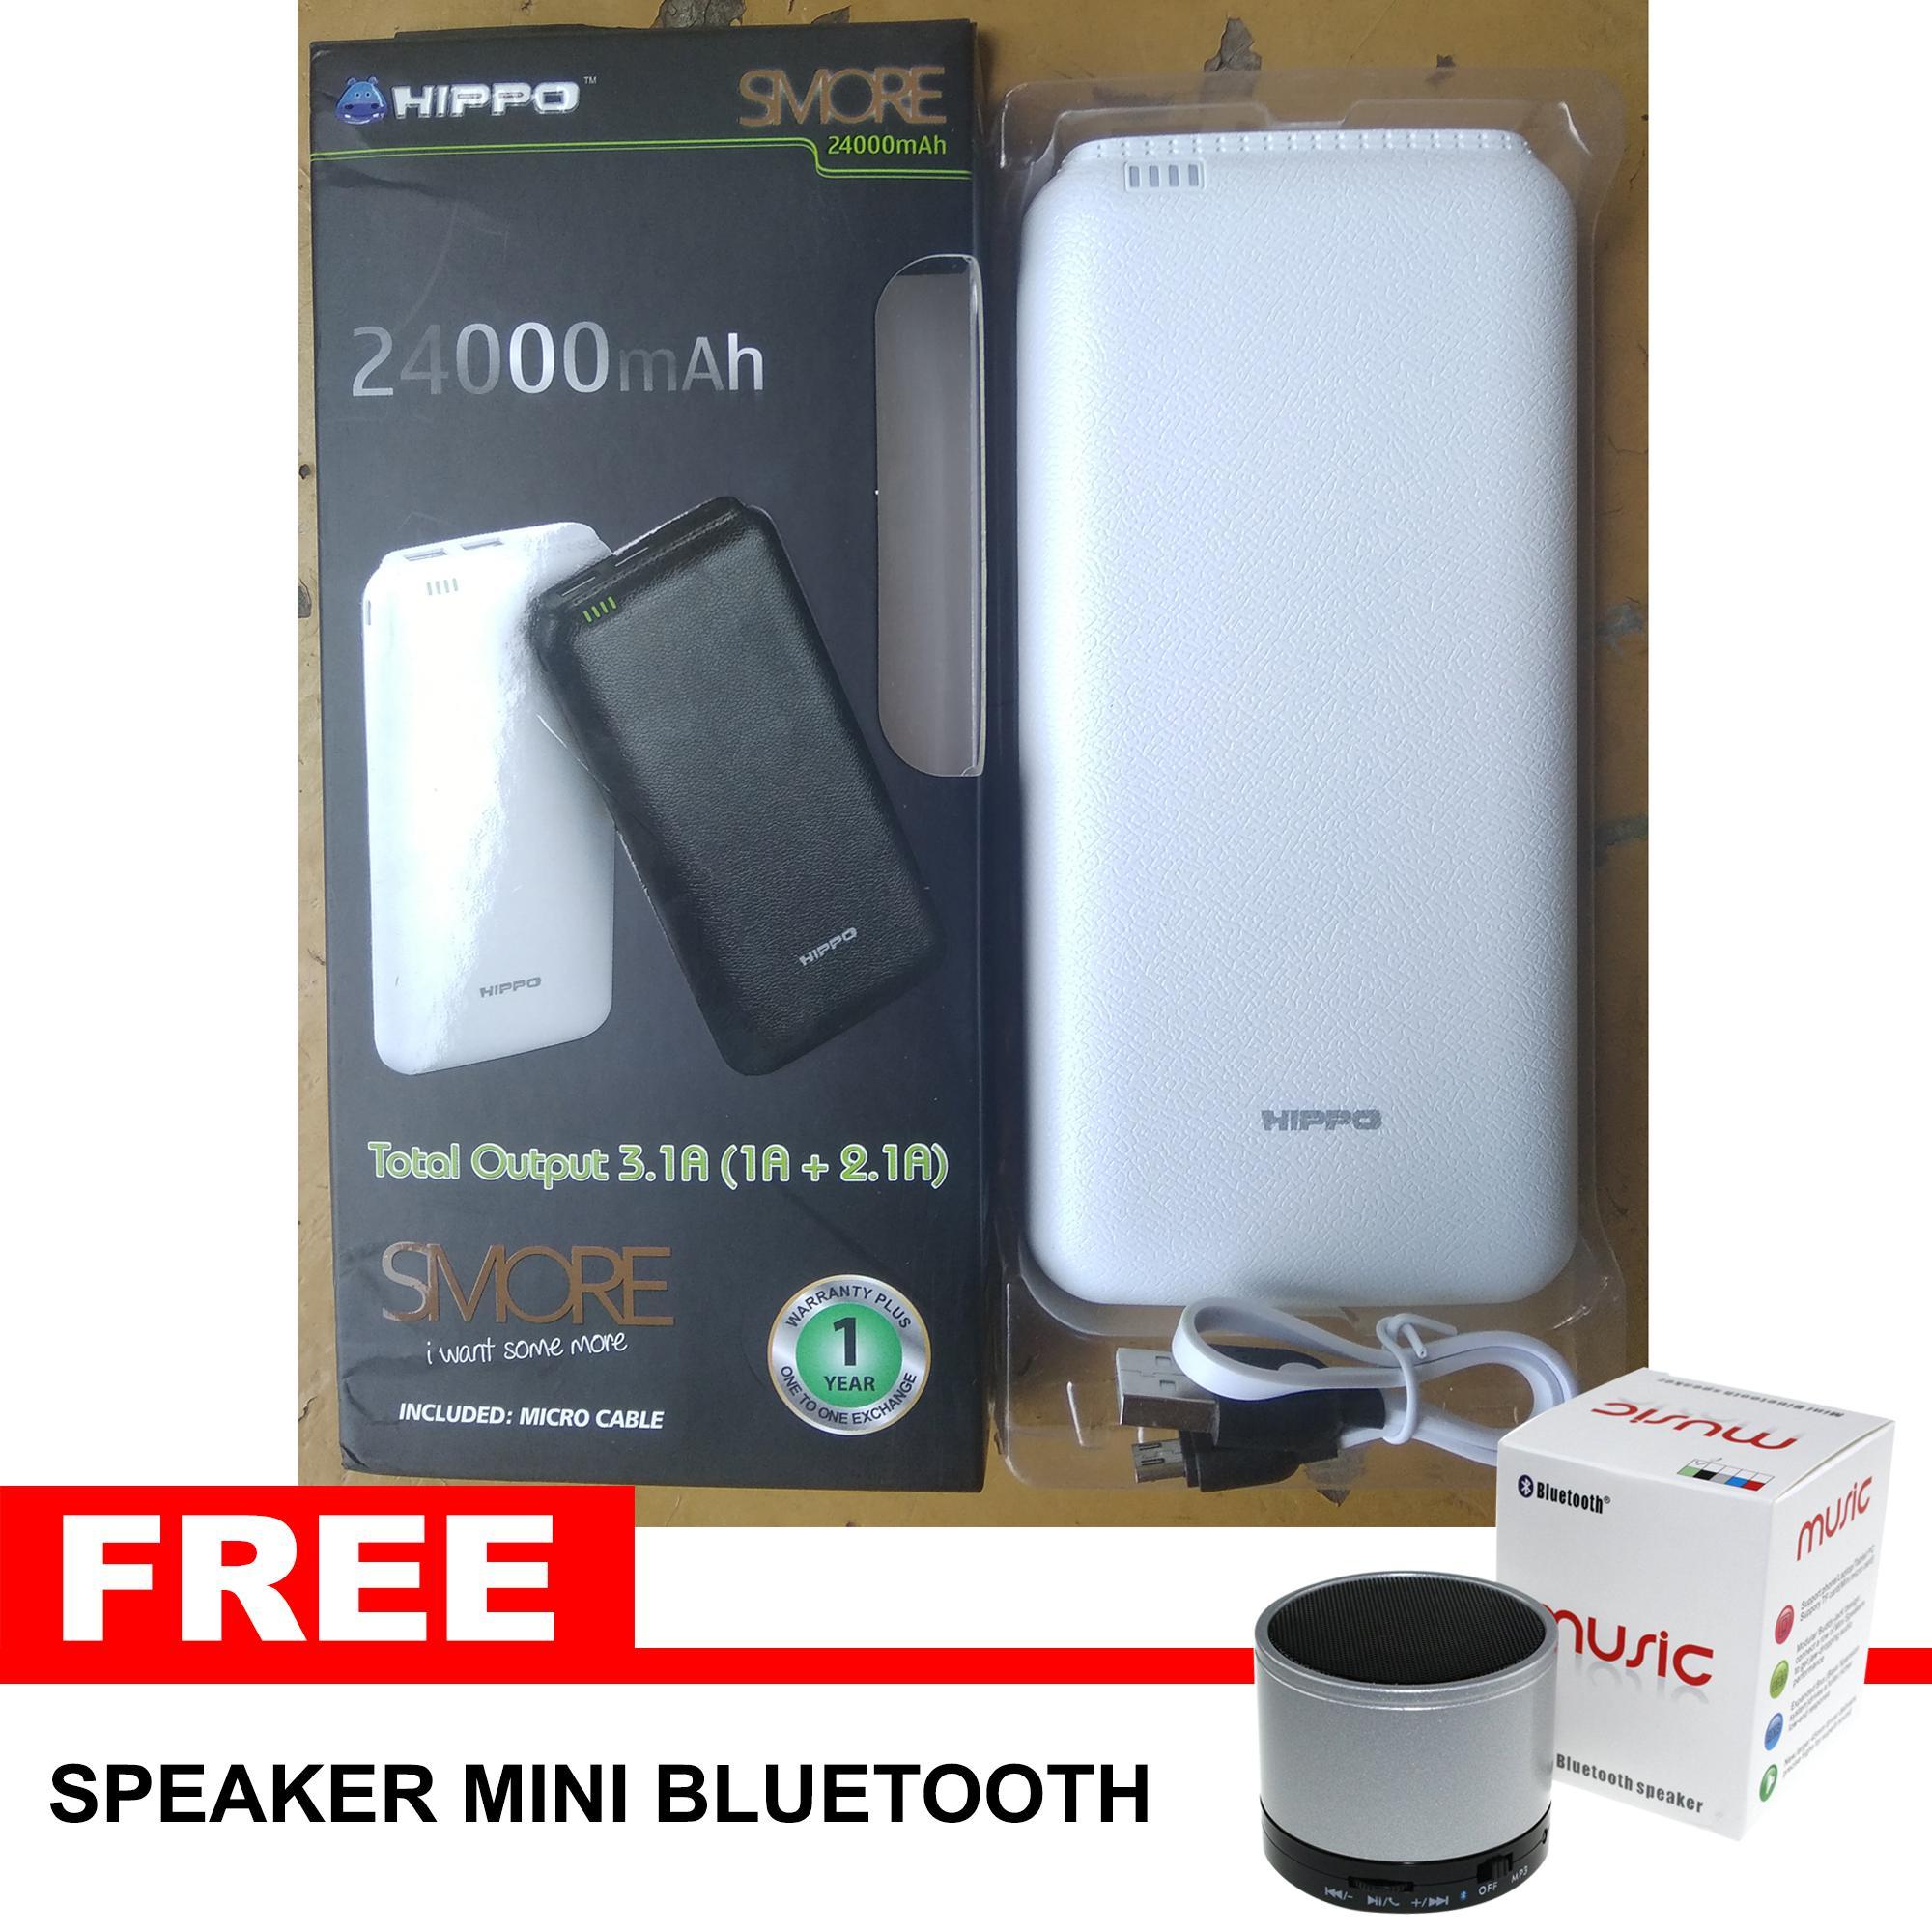 Powerbank Hippo Smore 24000 Mah Free Speaker Bluetooth Mini